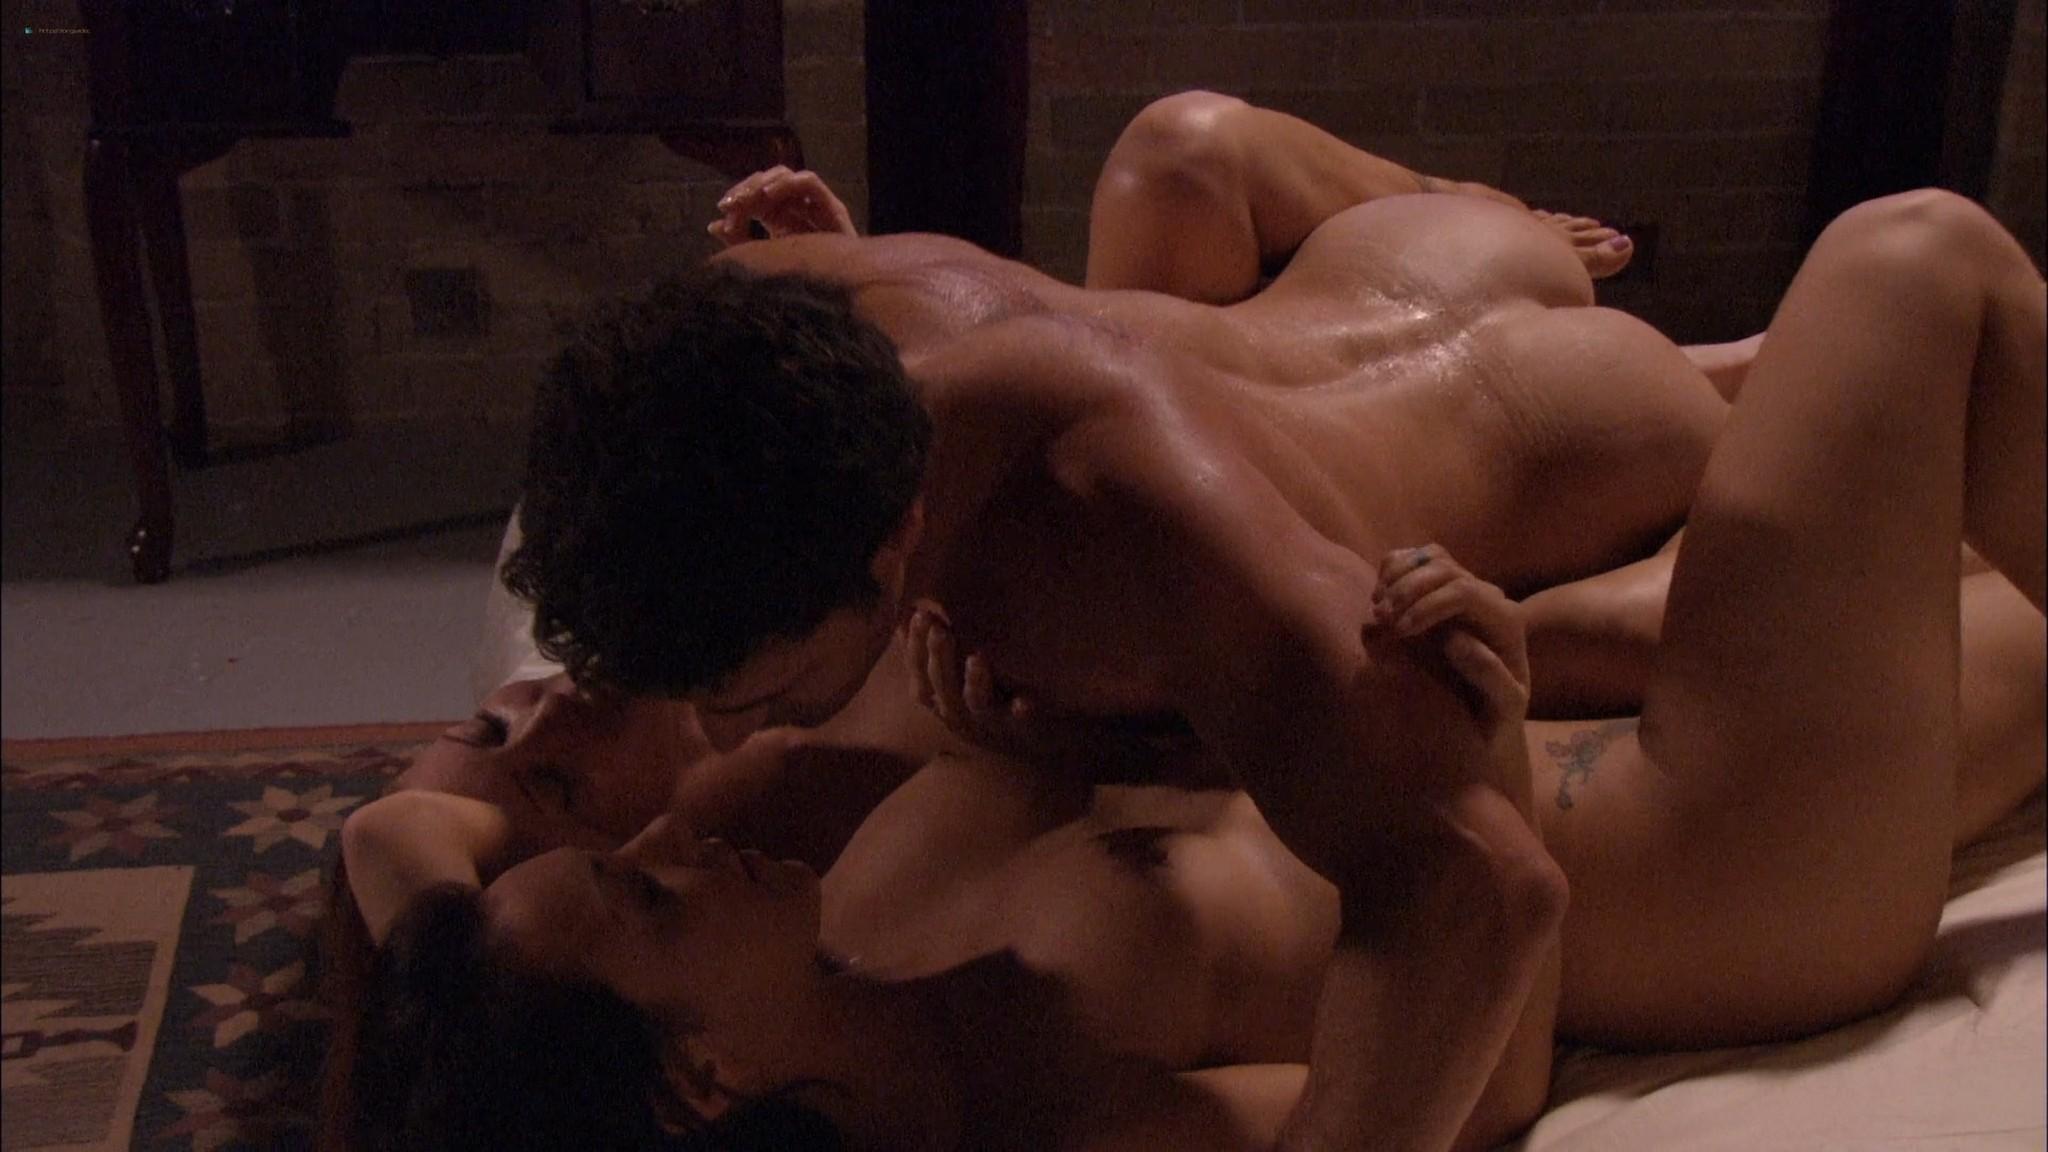 Lana Tailor nude sex threesome Noelle DuBois Allison Wood etc nude sex too Lingerie 2010 s2e5 HD 1080p 016